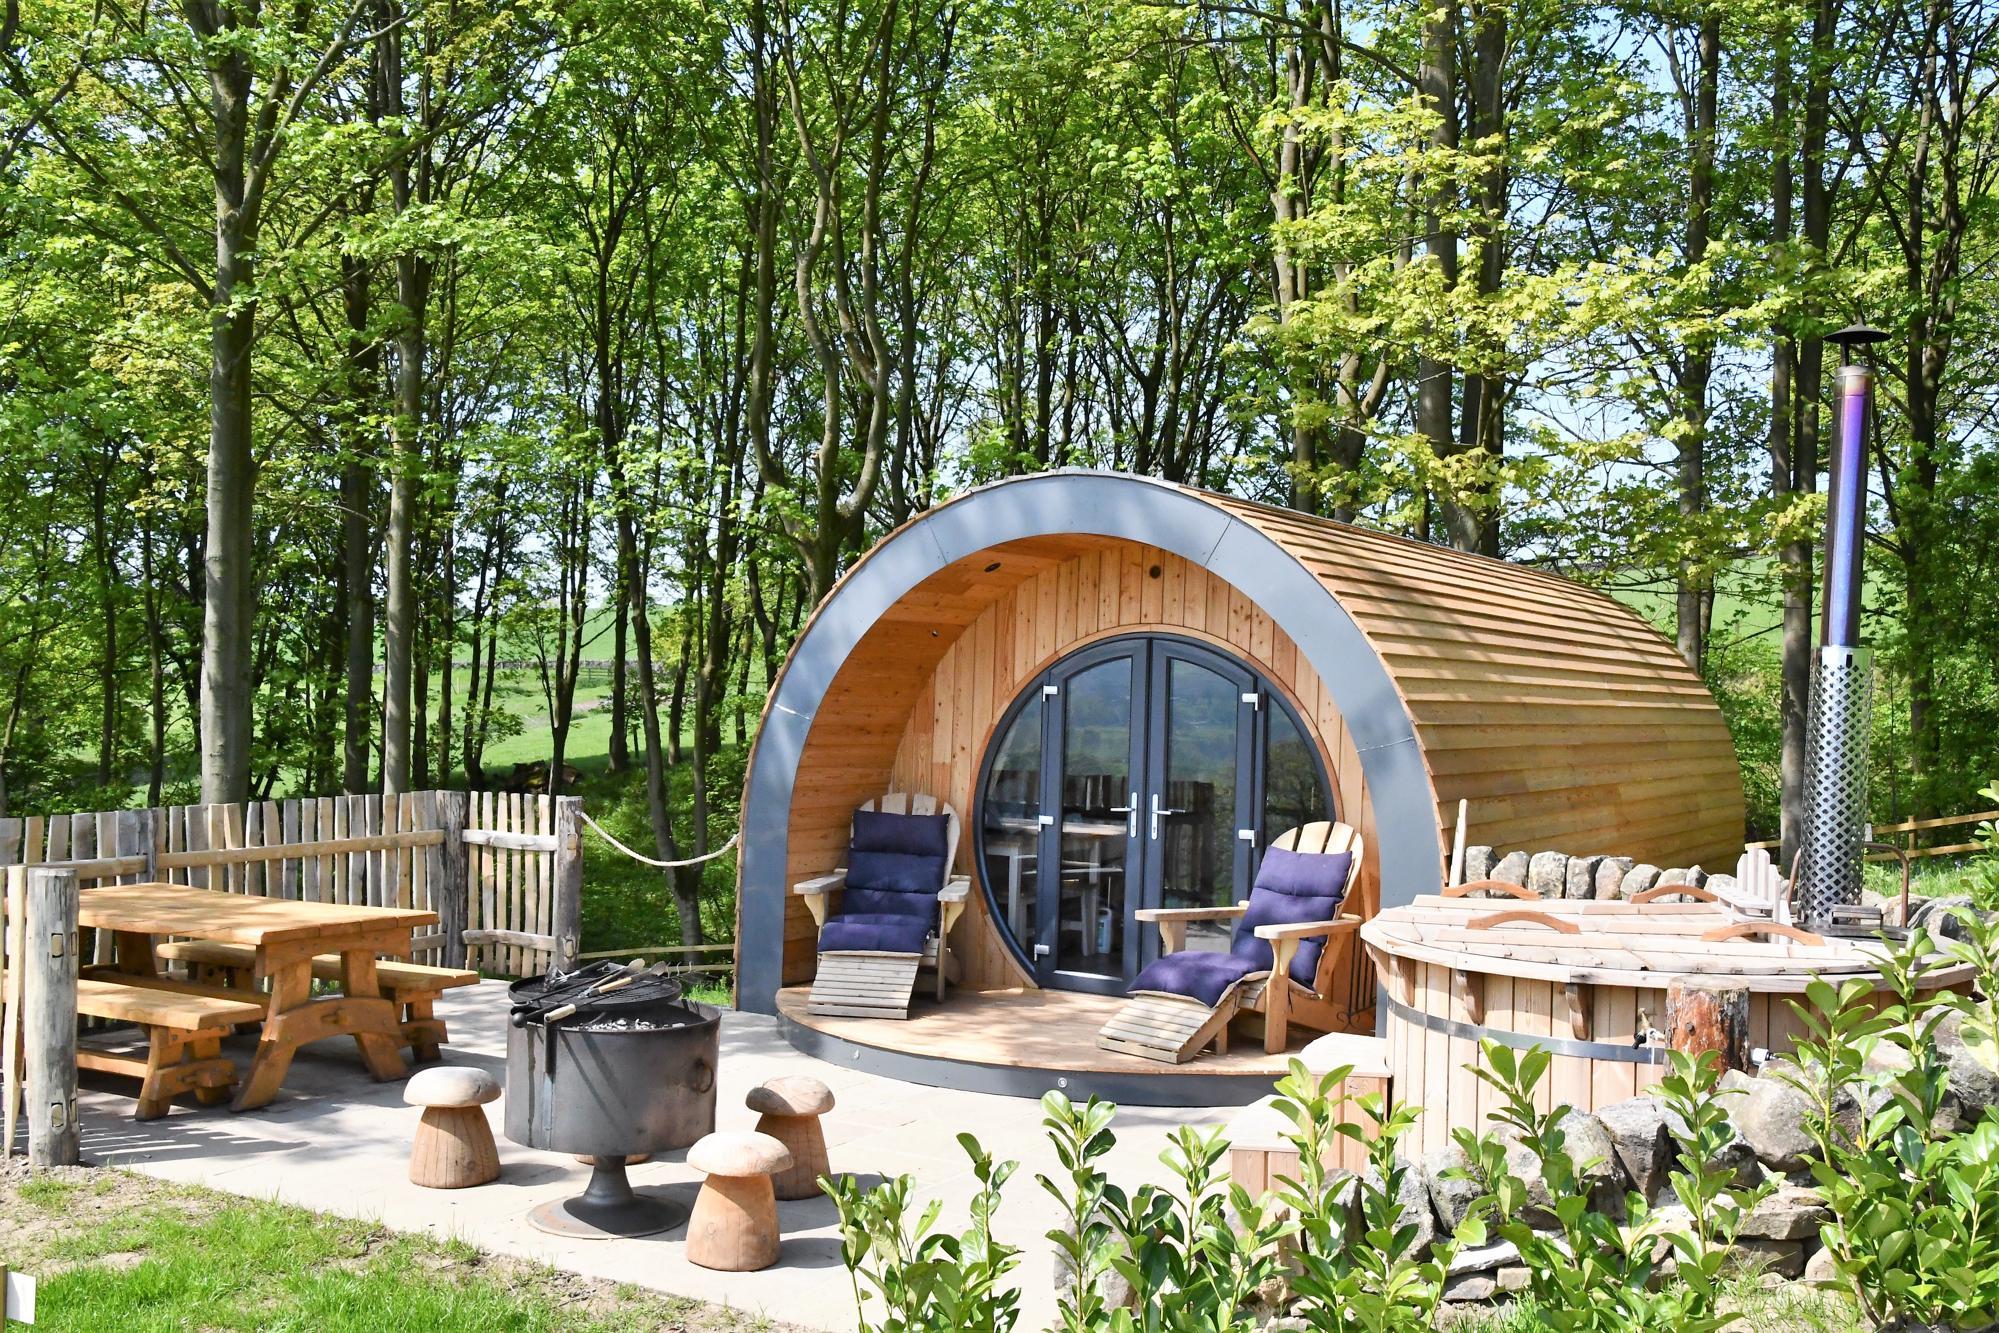 Campsites in Bolton Abbey – I Love This Campsite